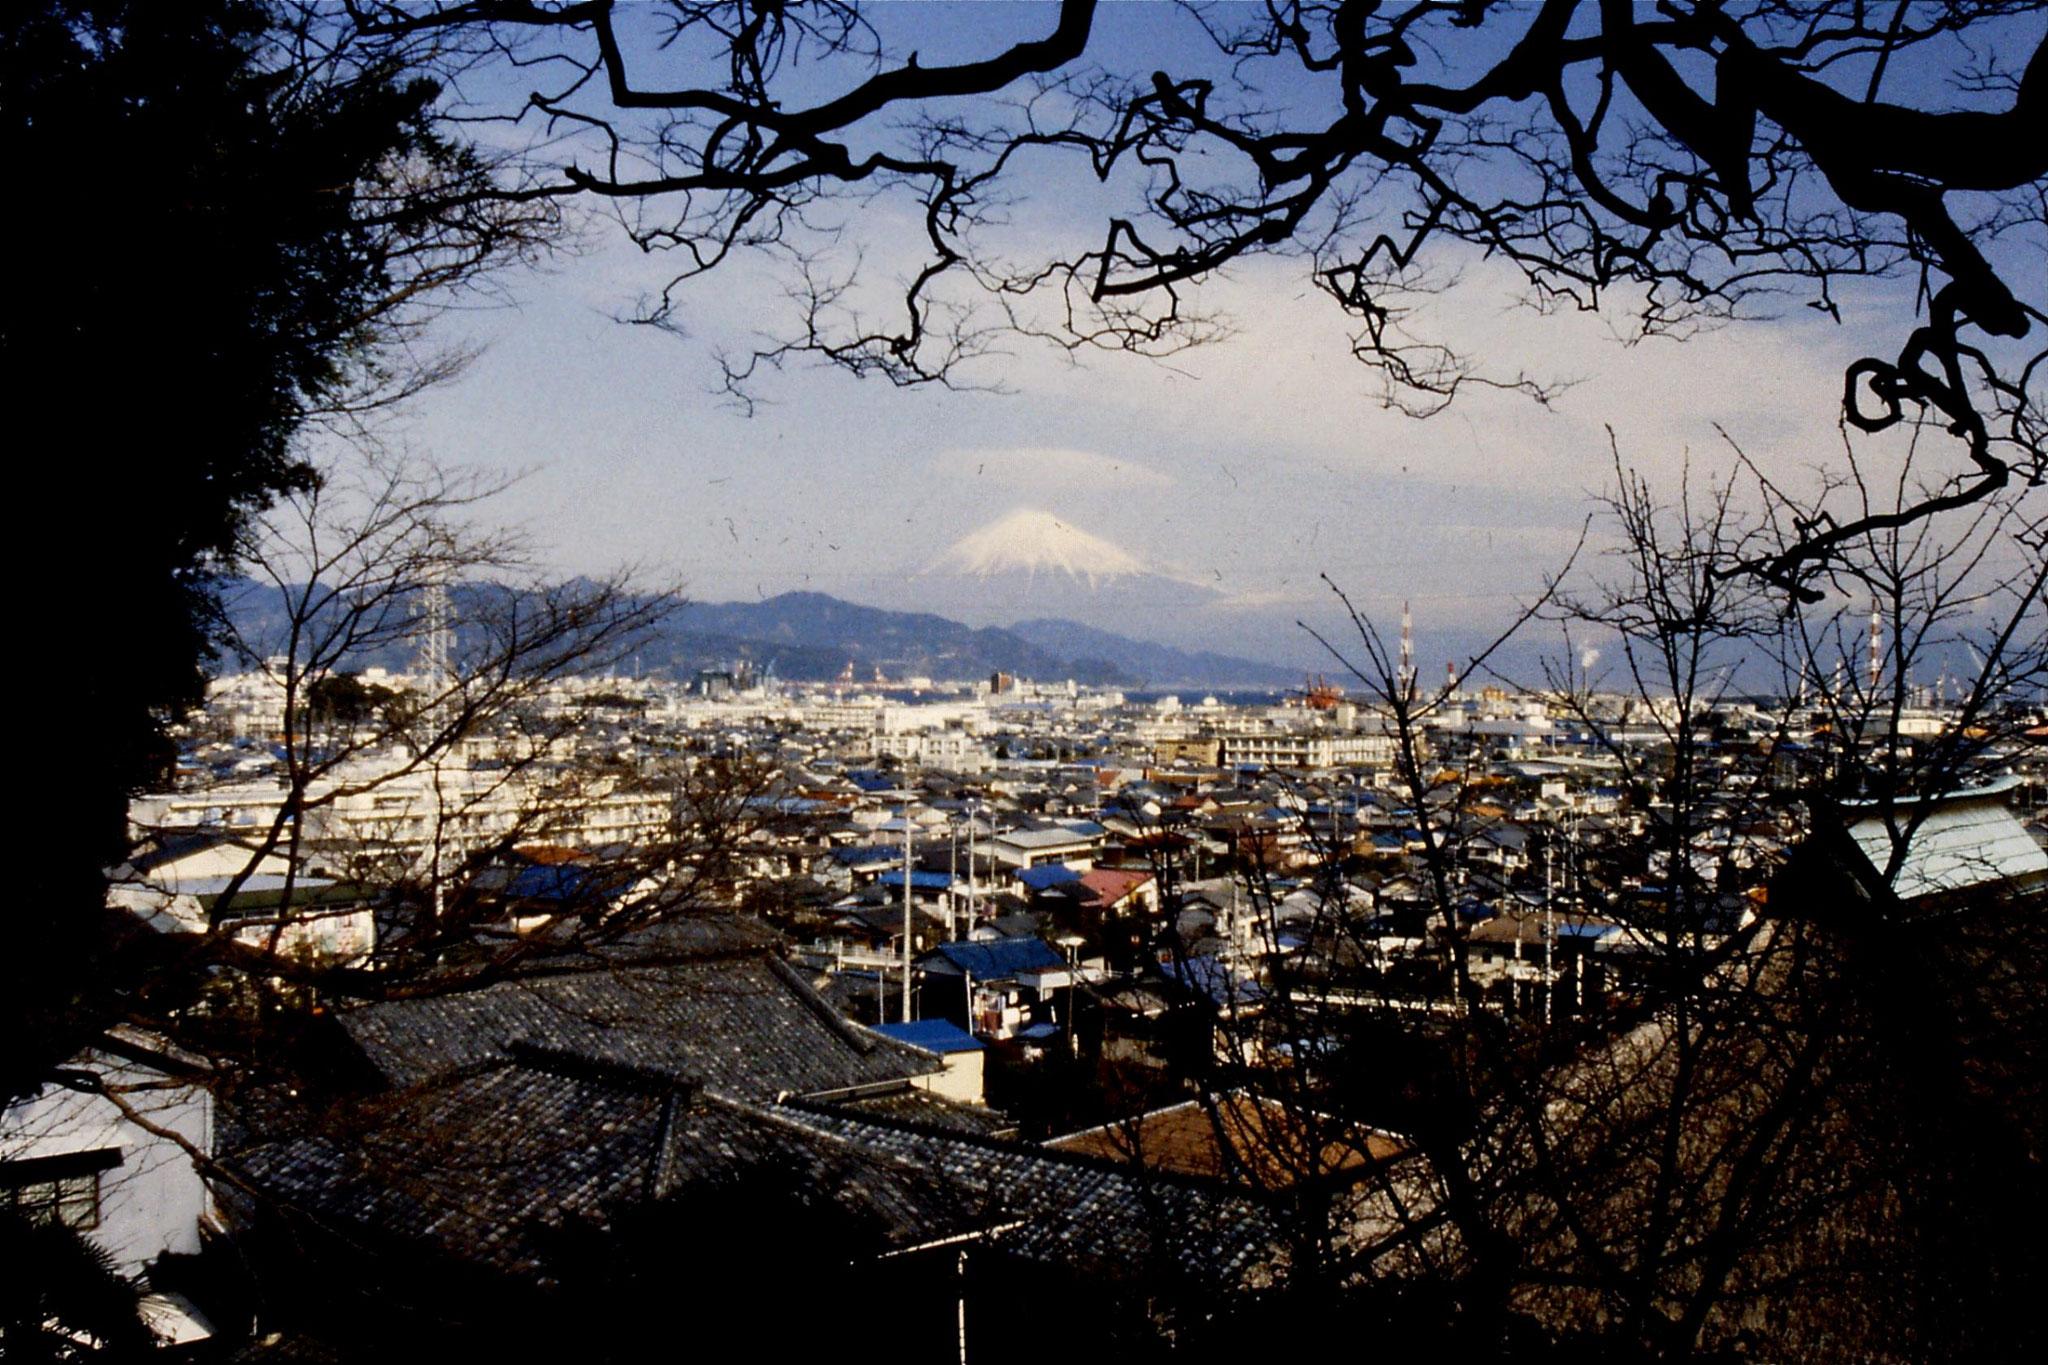 27/1/1989: 19: Fuji and Shimizu town